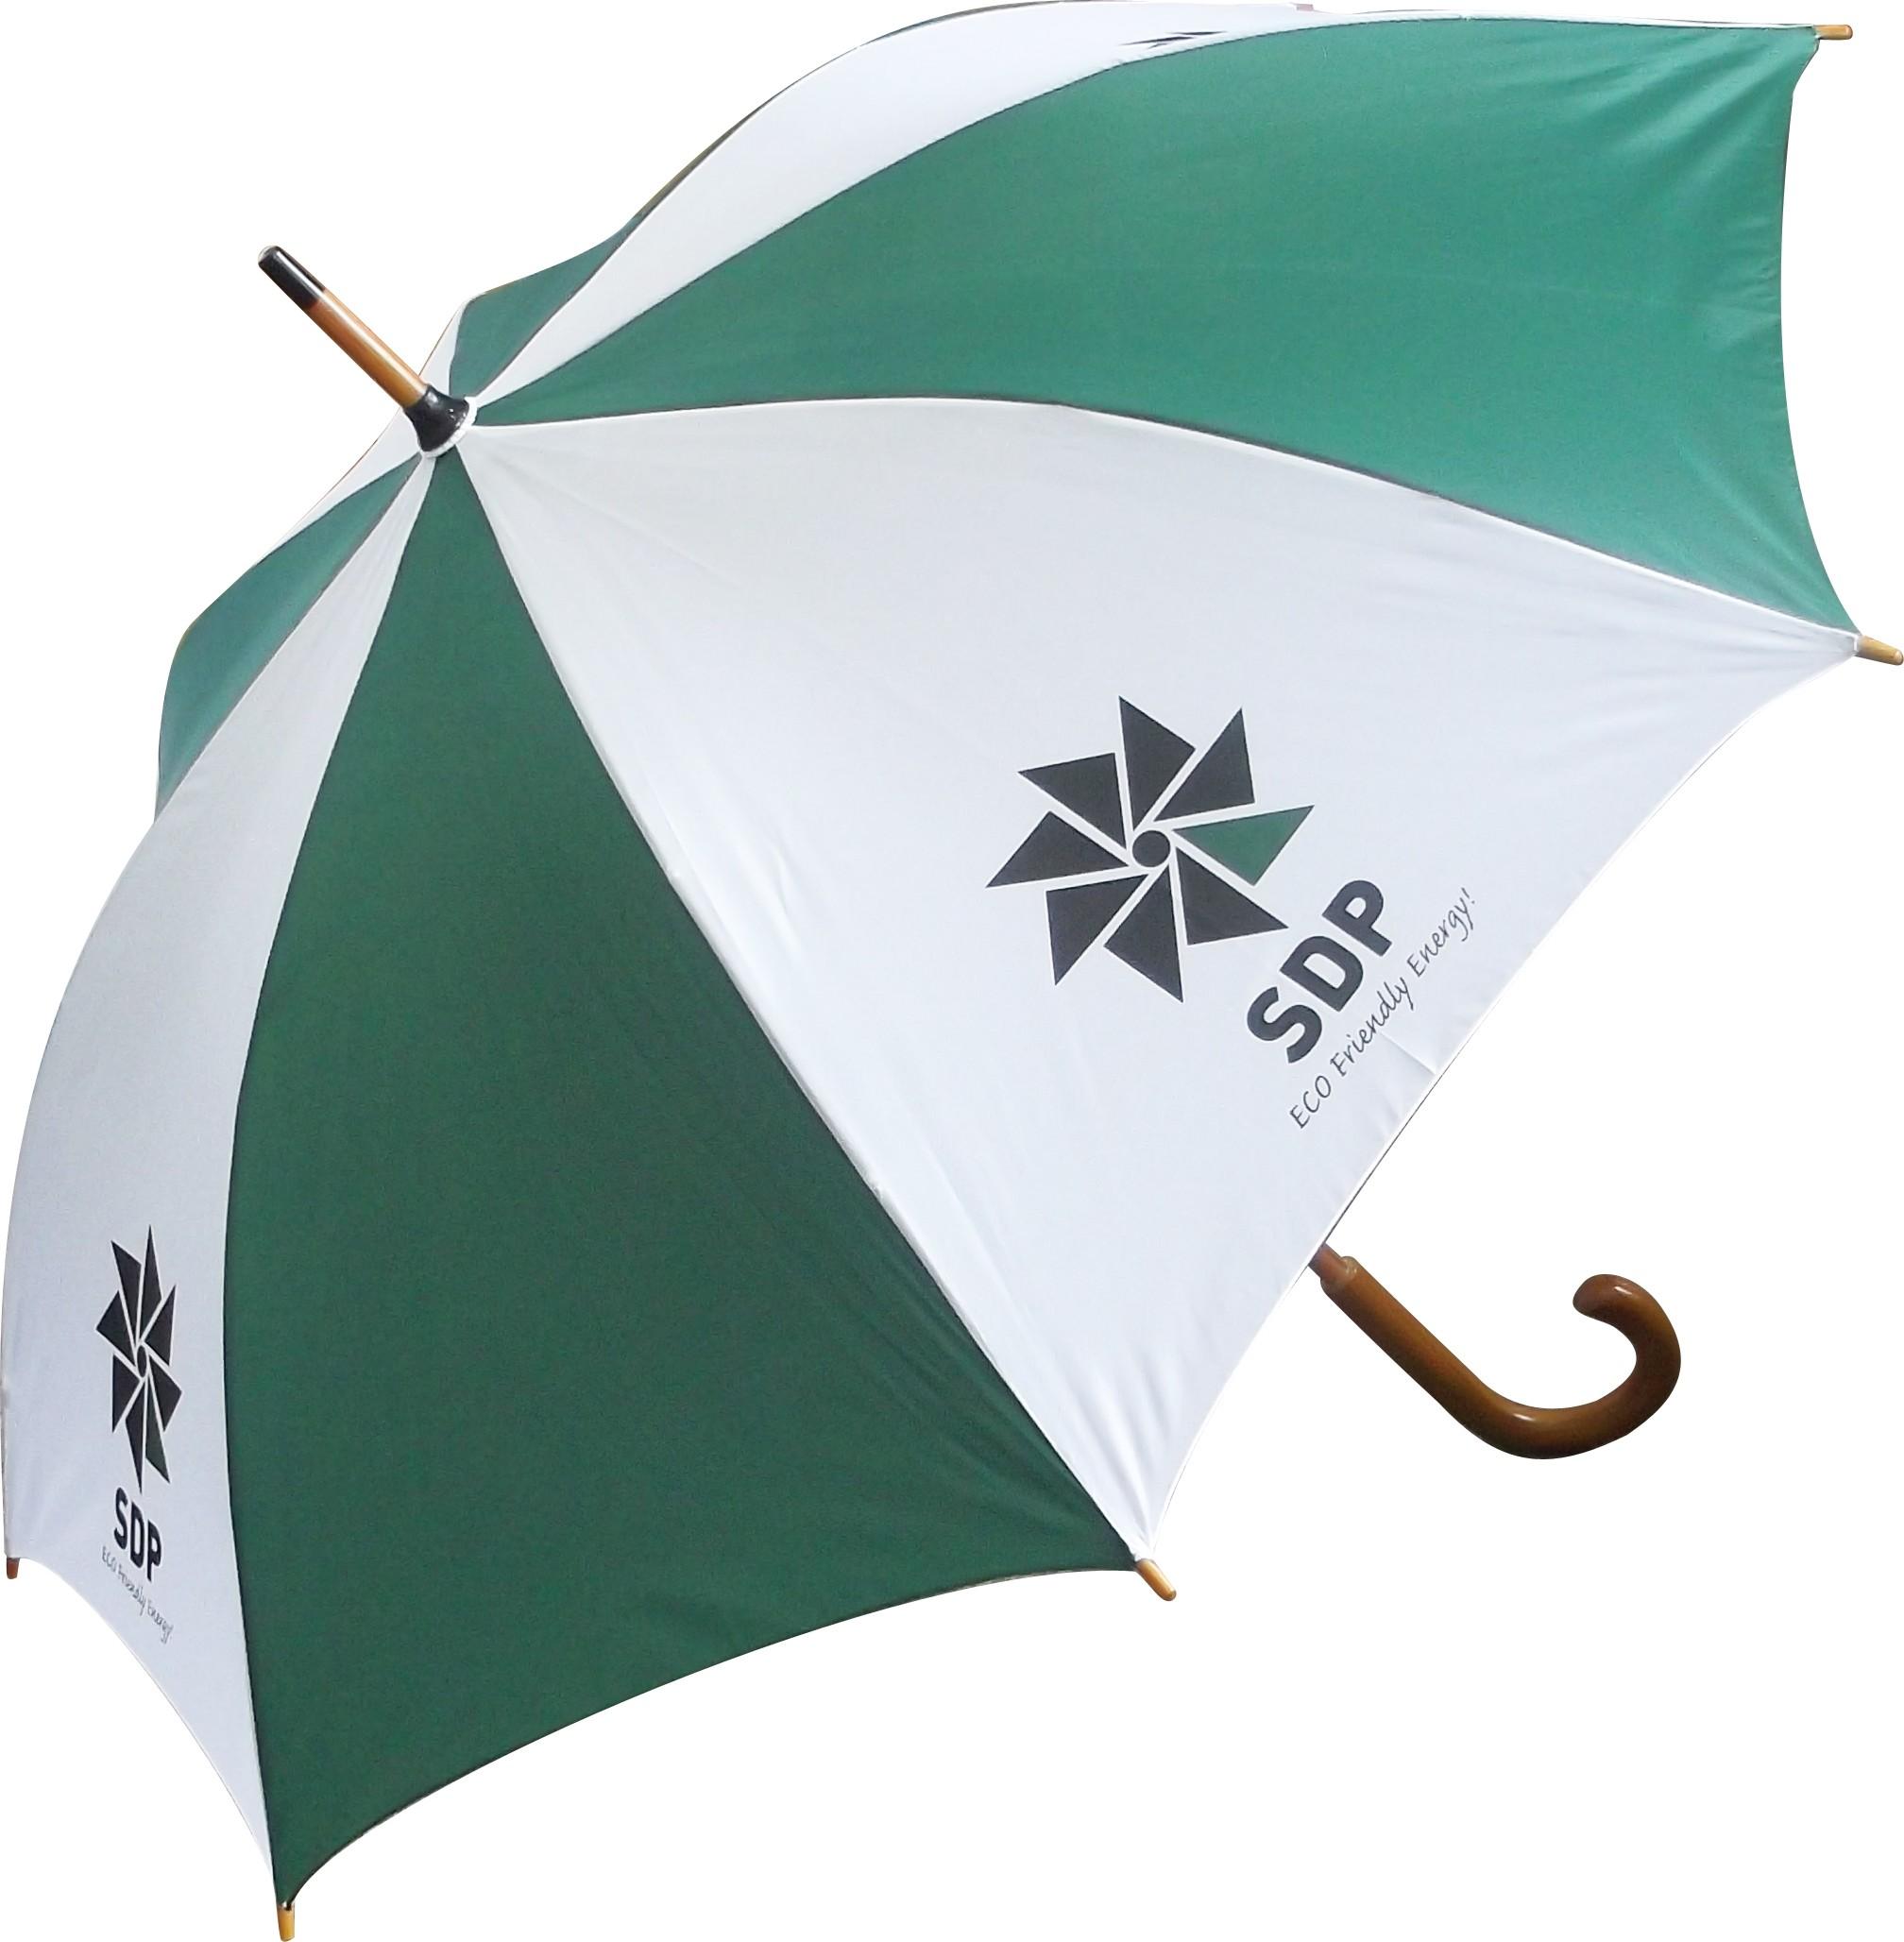 Printed Promotional Classic Wood Crook Umbrella